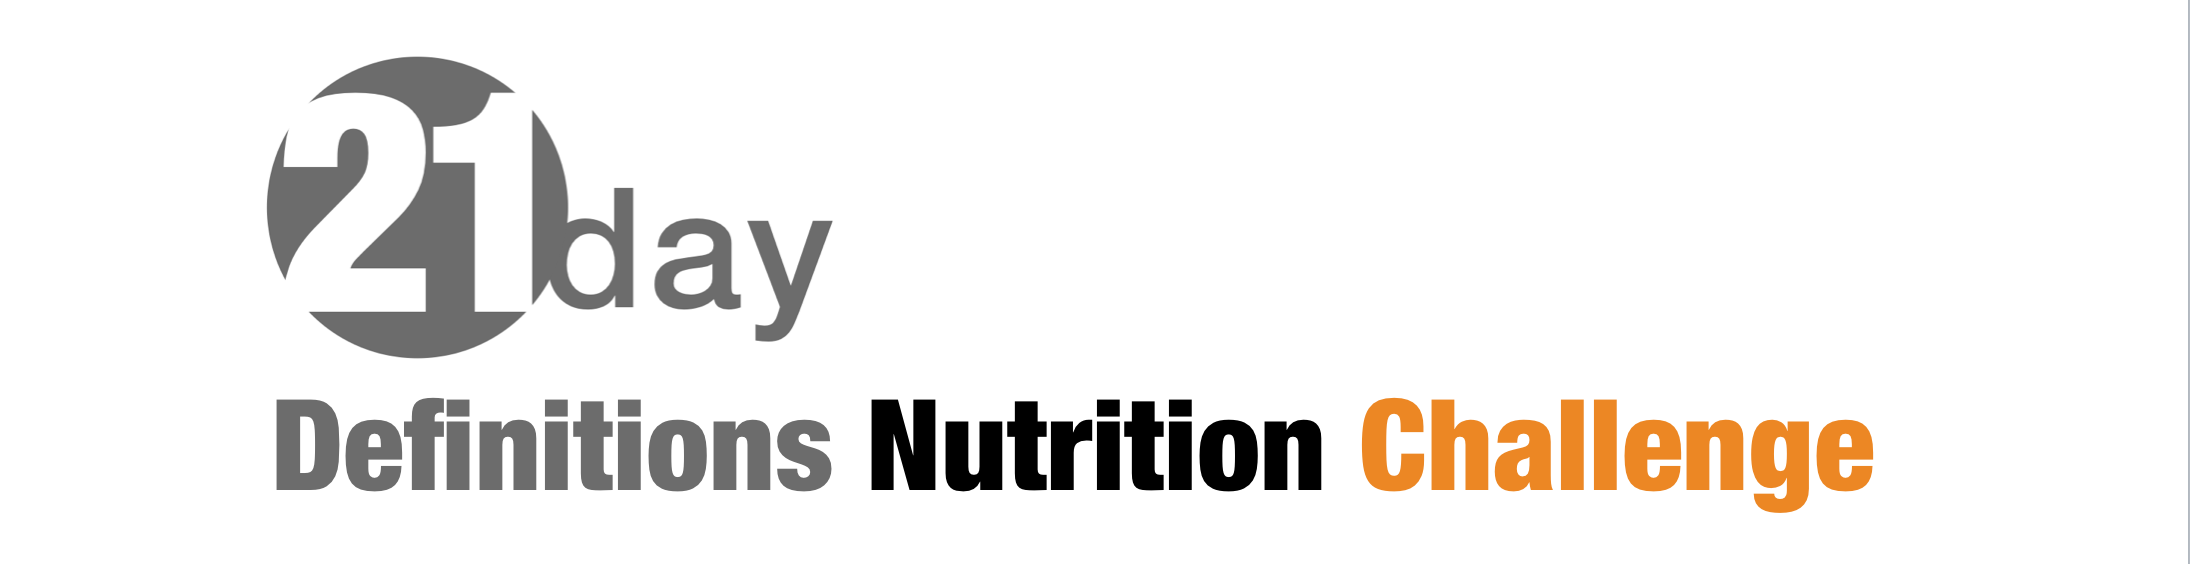 nutritionchallenge